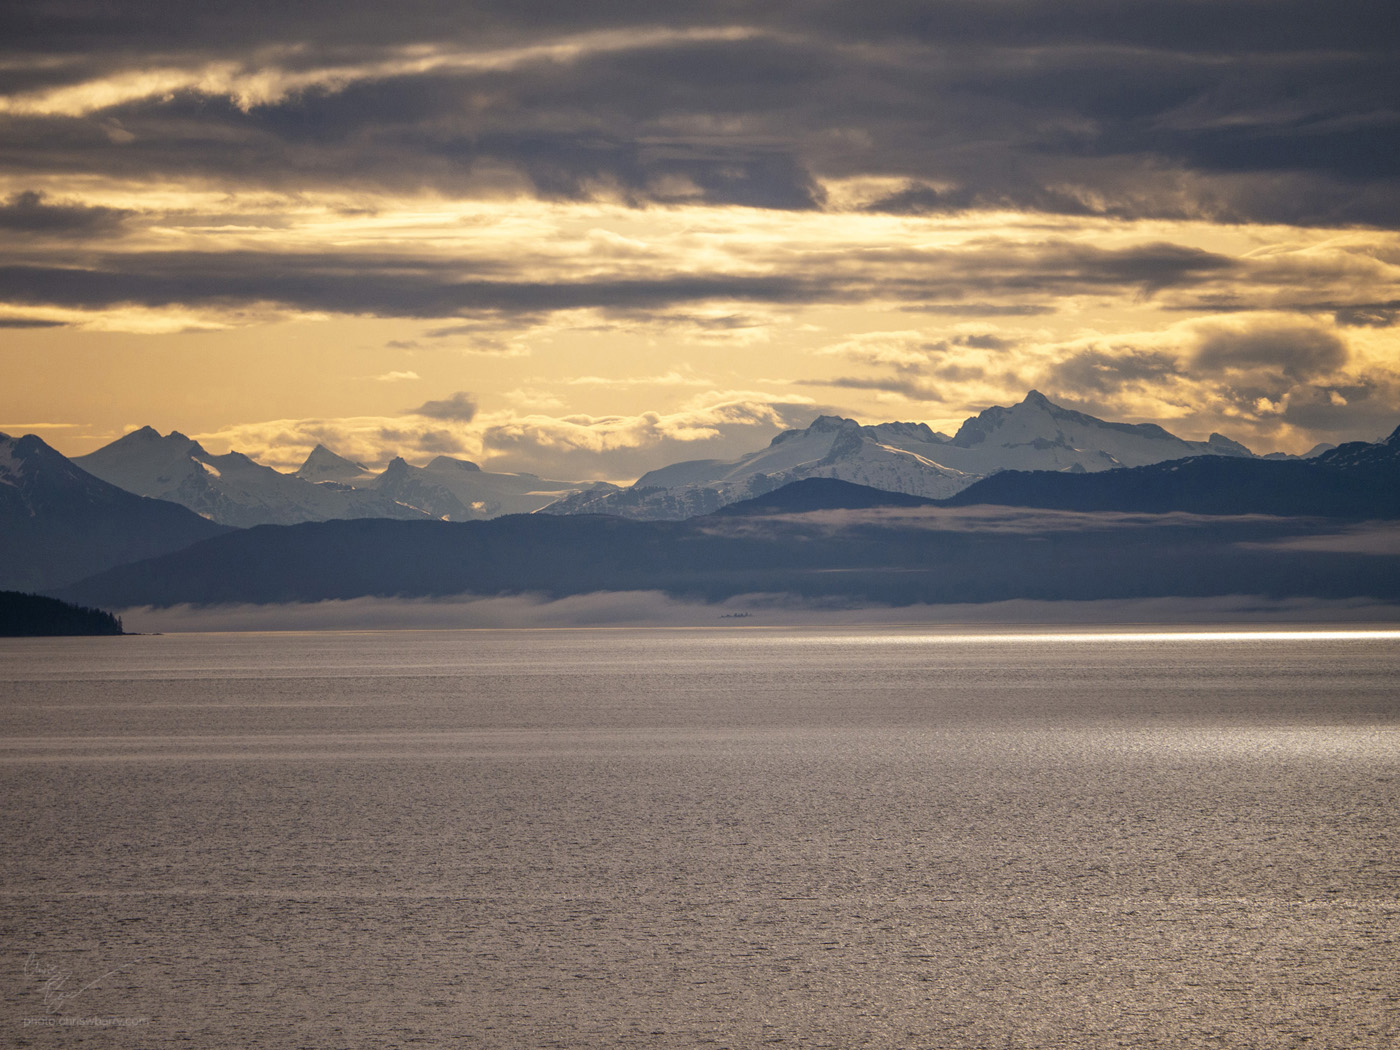 6-03-18: Alaska Sunrise